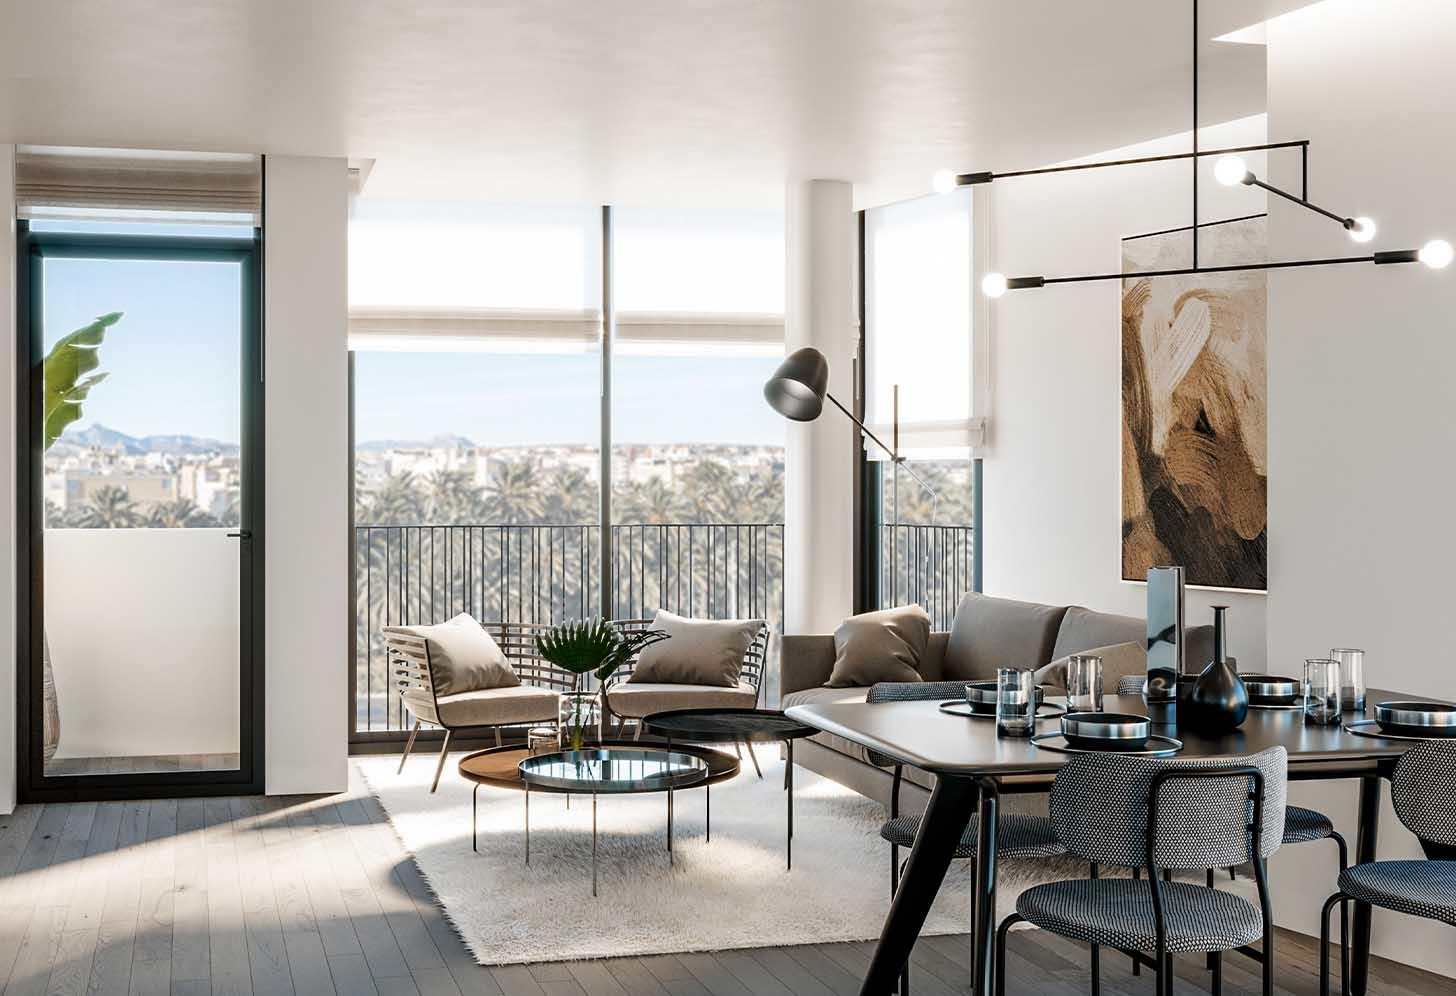 immobilier neuf espagne costa blanca on-a4 san vicente salon